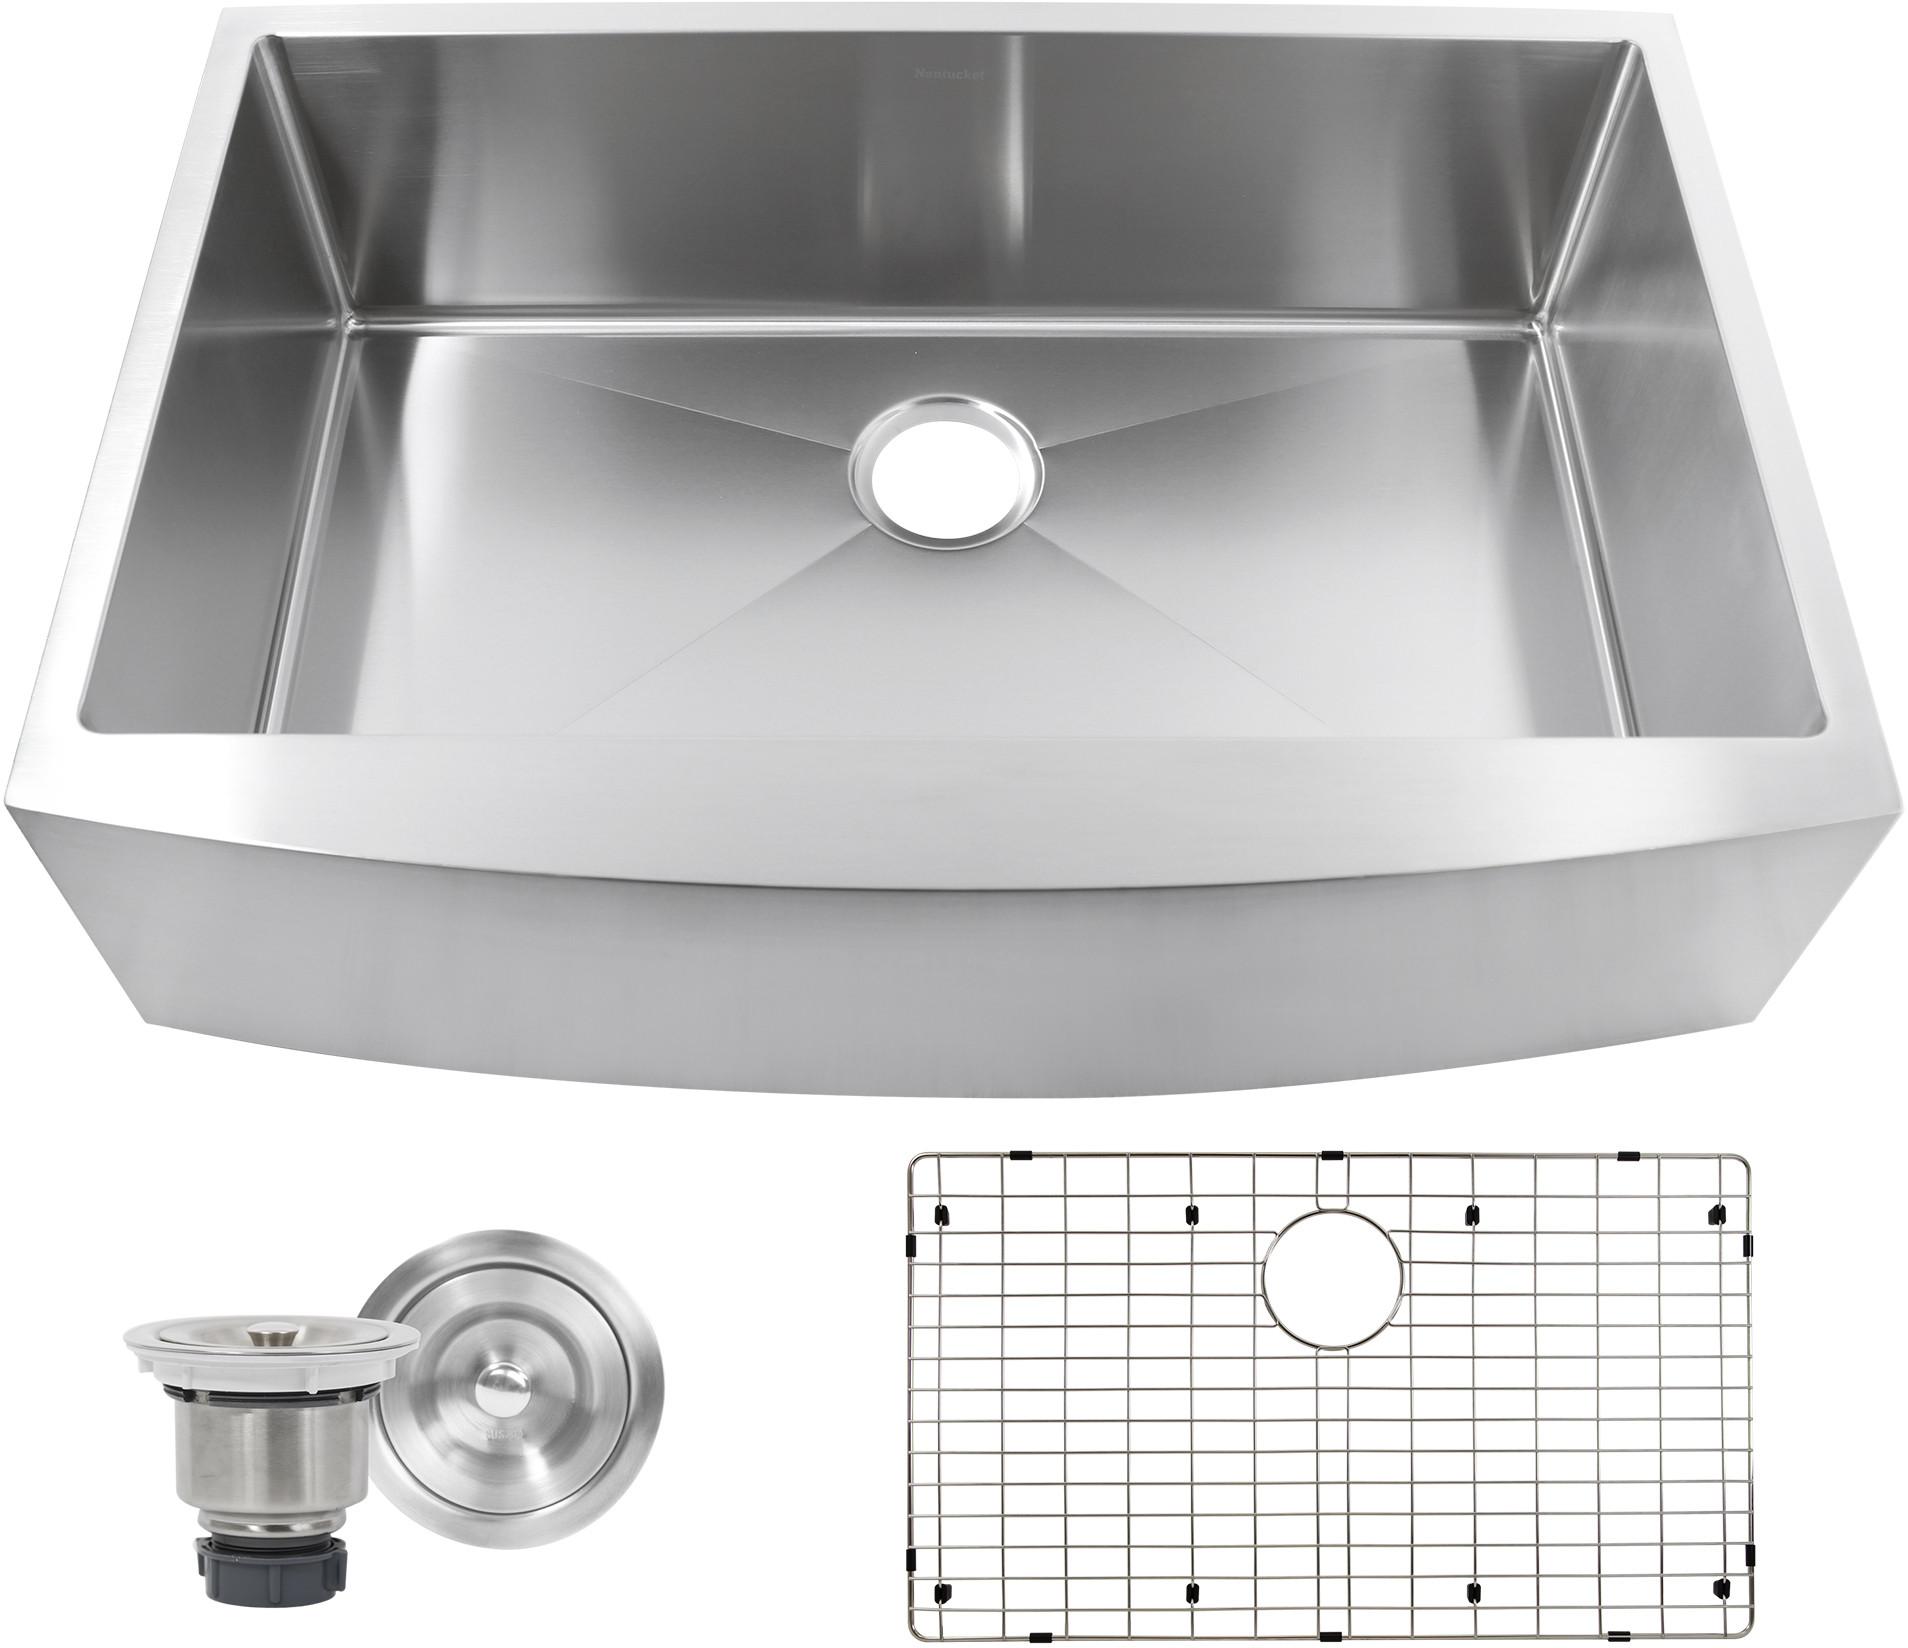 Nantucket Sinks Pro Series APRON332210SR16